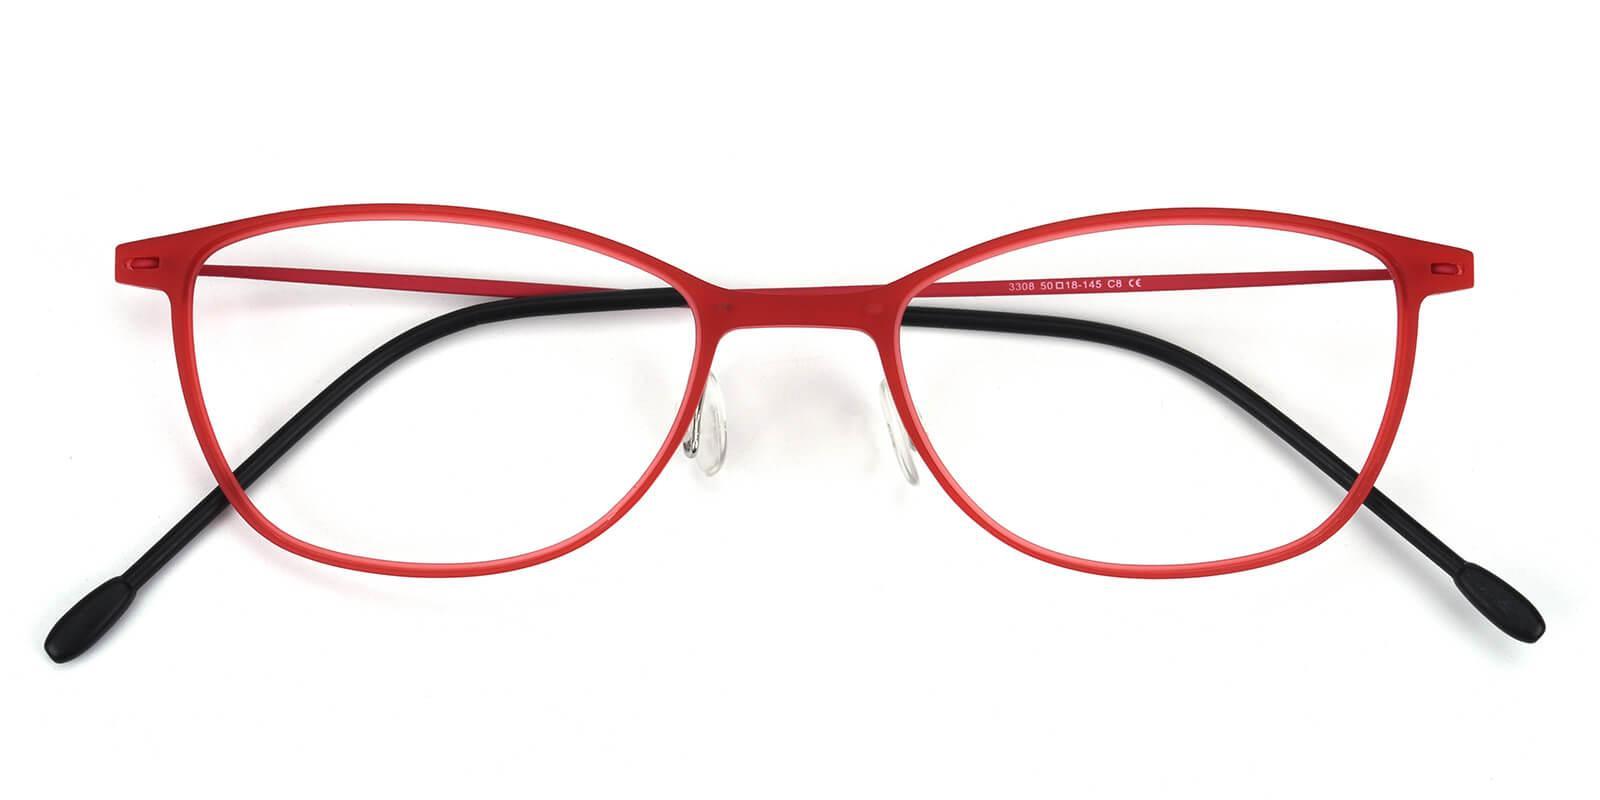 Pridgen-Red-Rectangle / Cat-Combination-Eyeglasses-detail